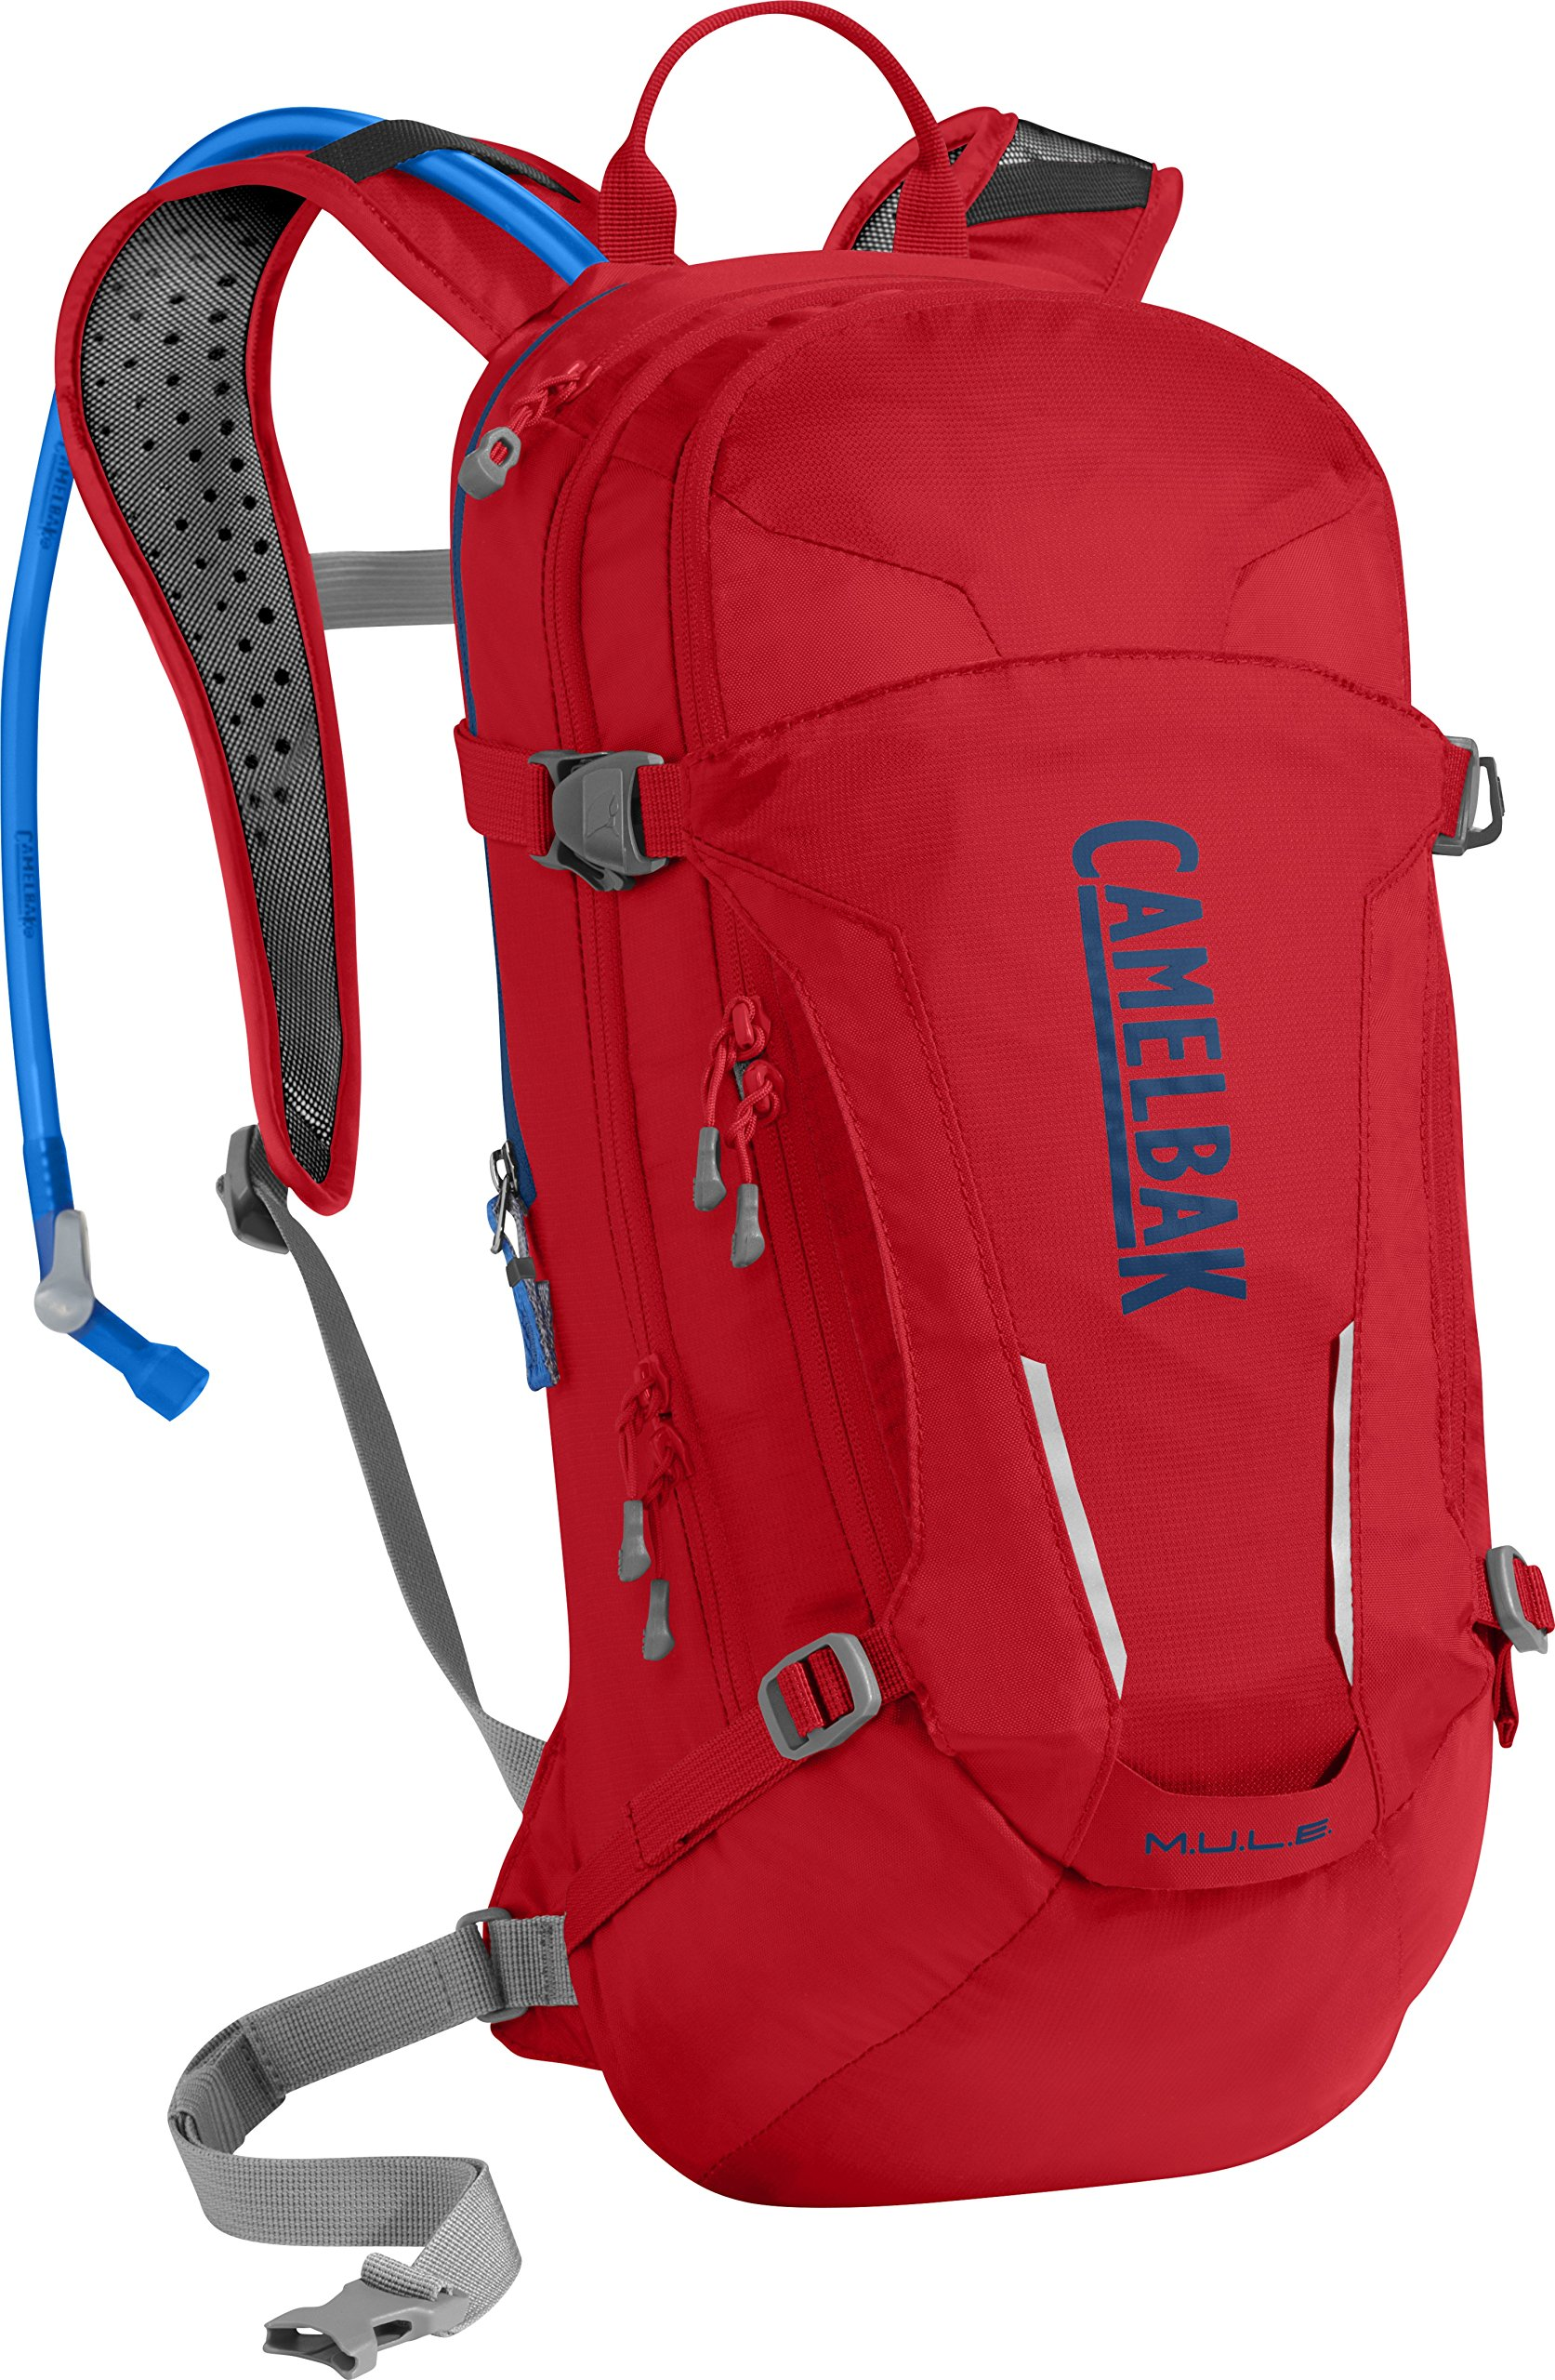 CamelBak M.U.L.E. Crux Reservoir Hydration Pack, Racing Red/Pitch Blue, 3 L/100 oz by CamelBak